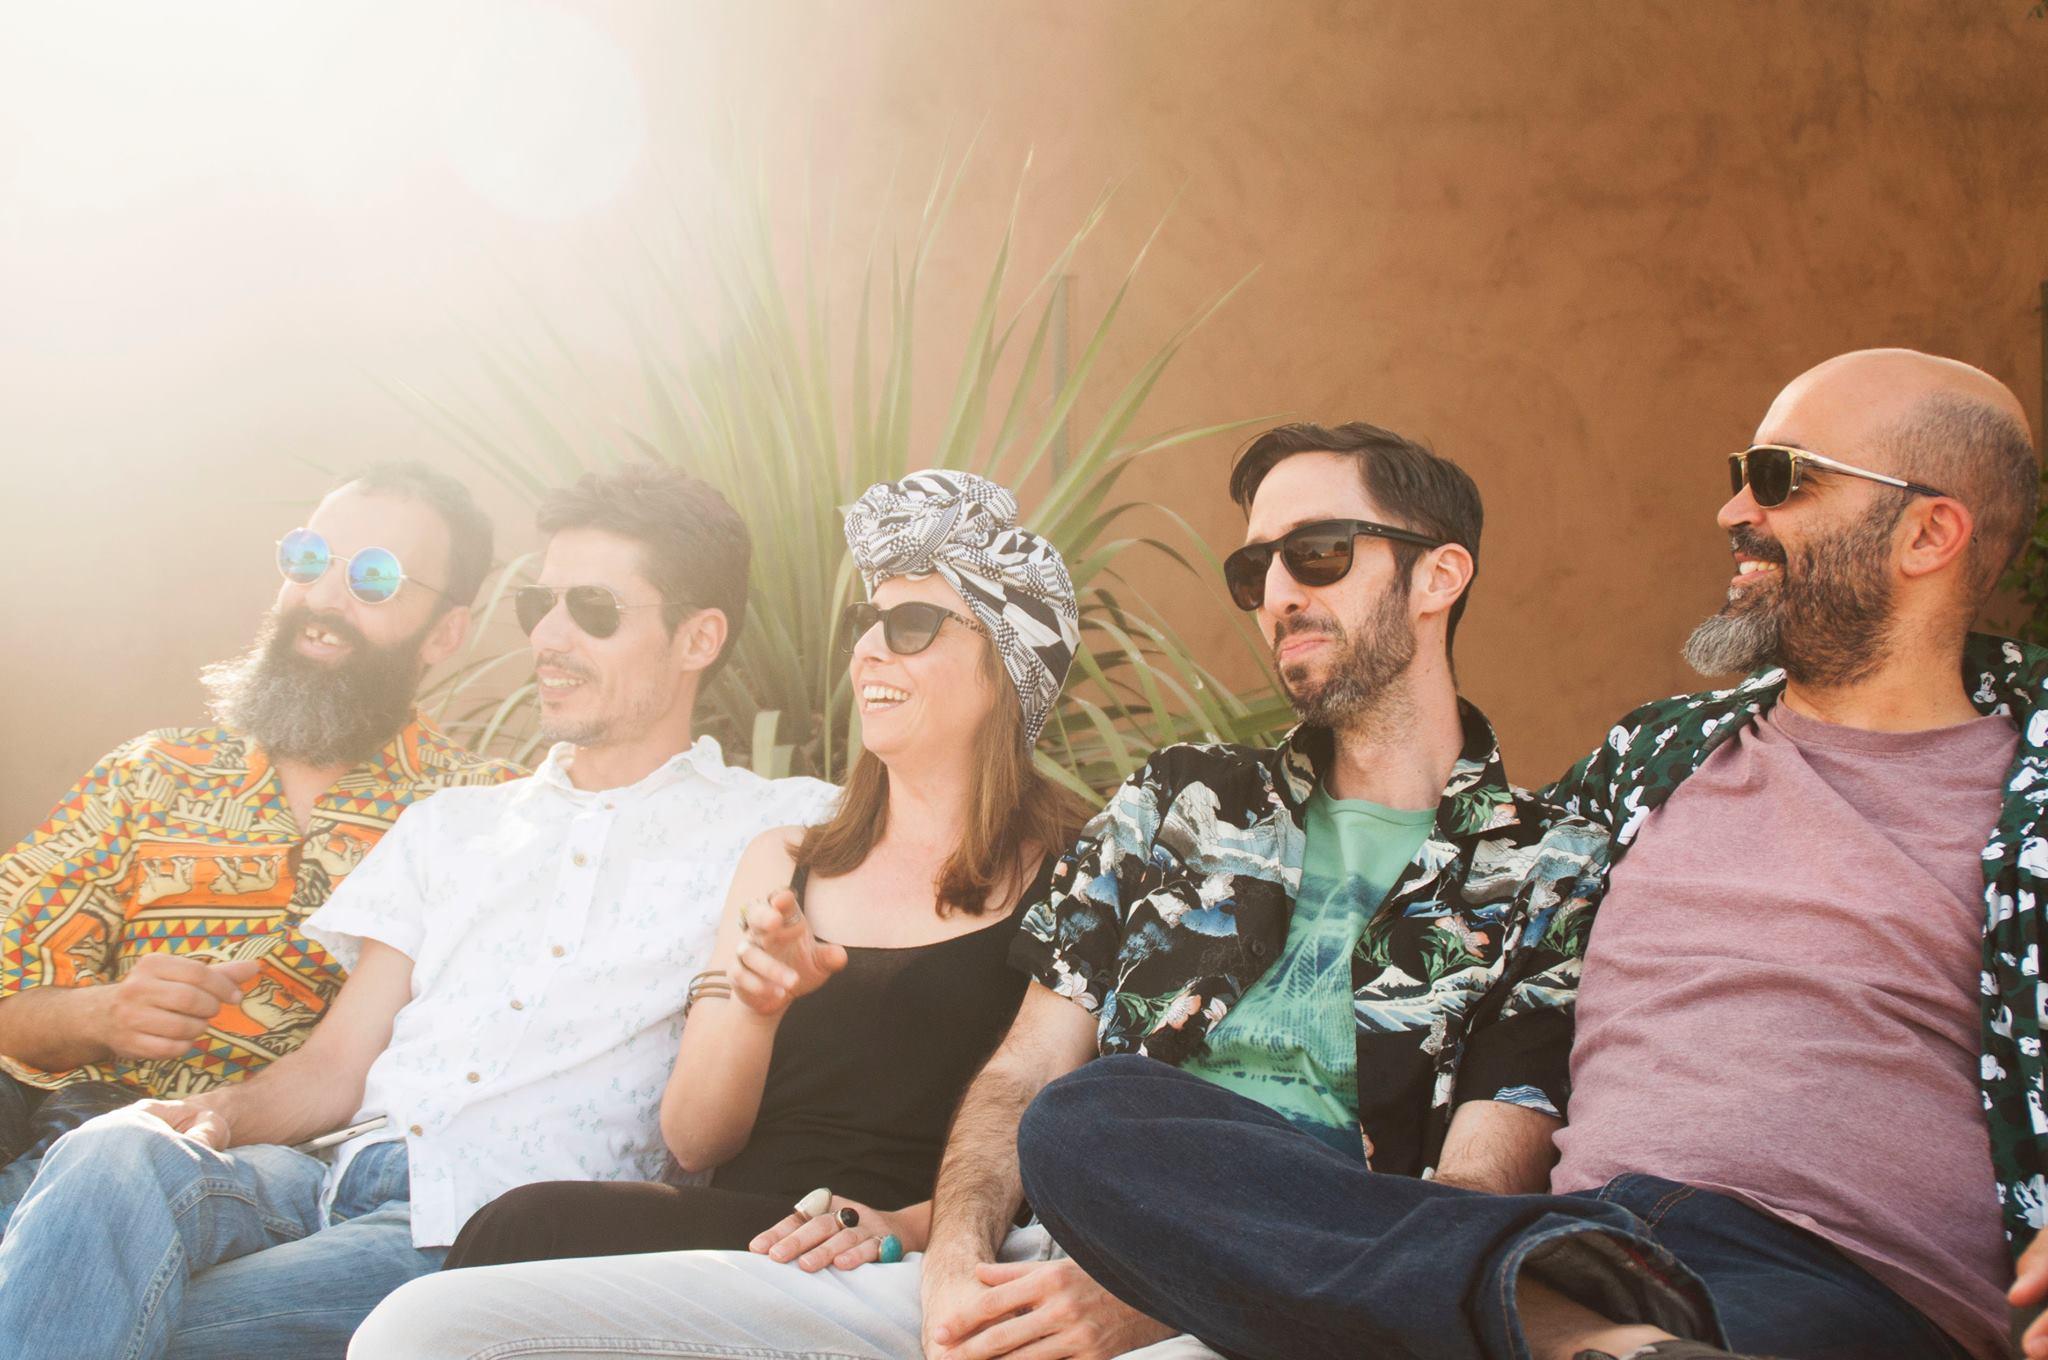 Carmela Visone & The Grooves cierra la temporada en Rayuela